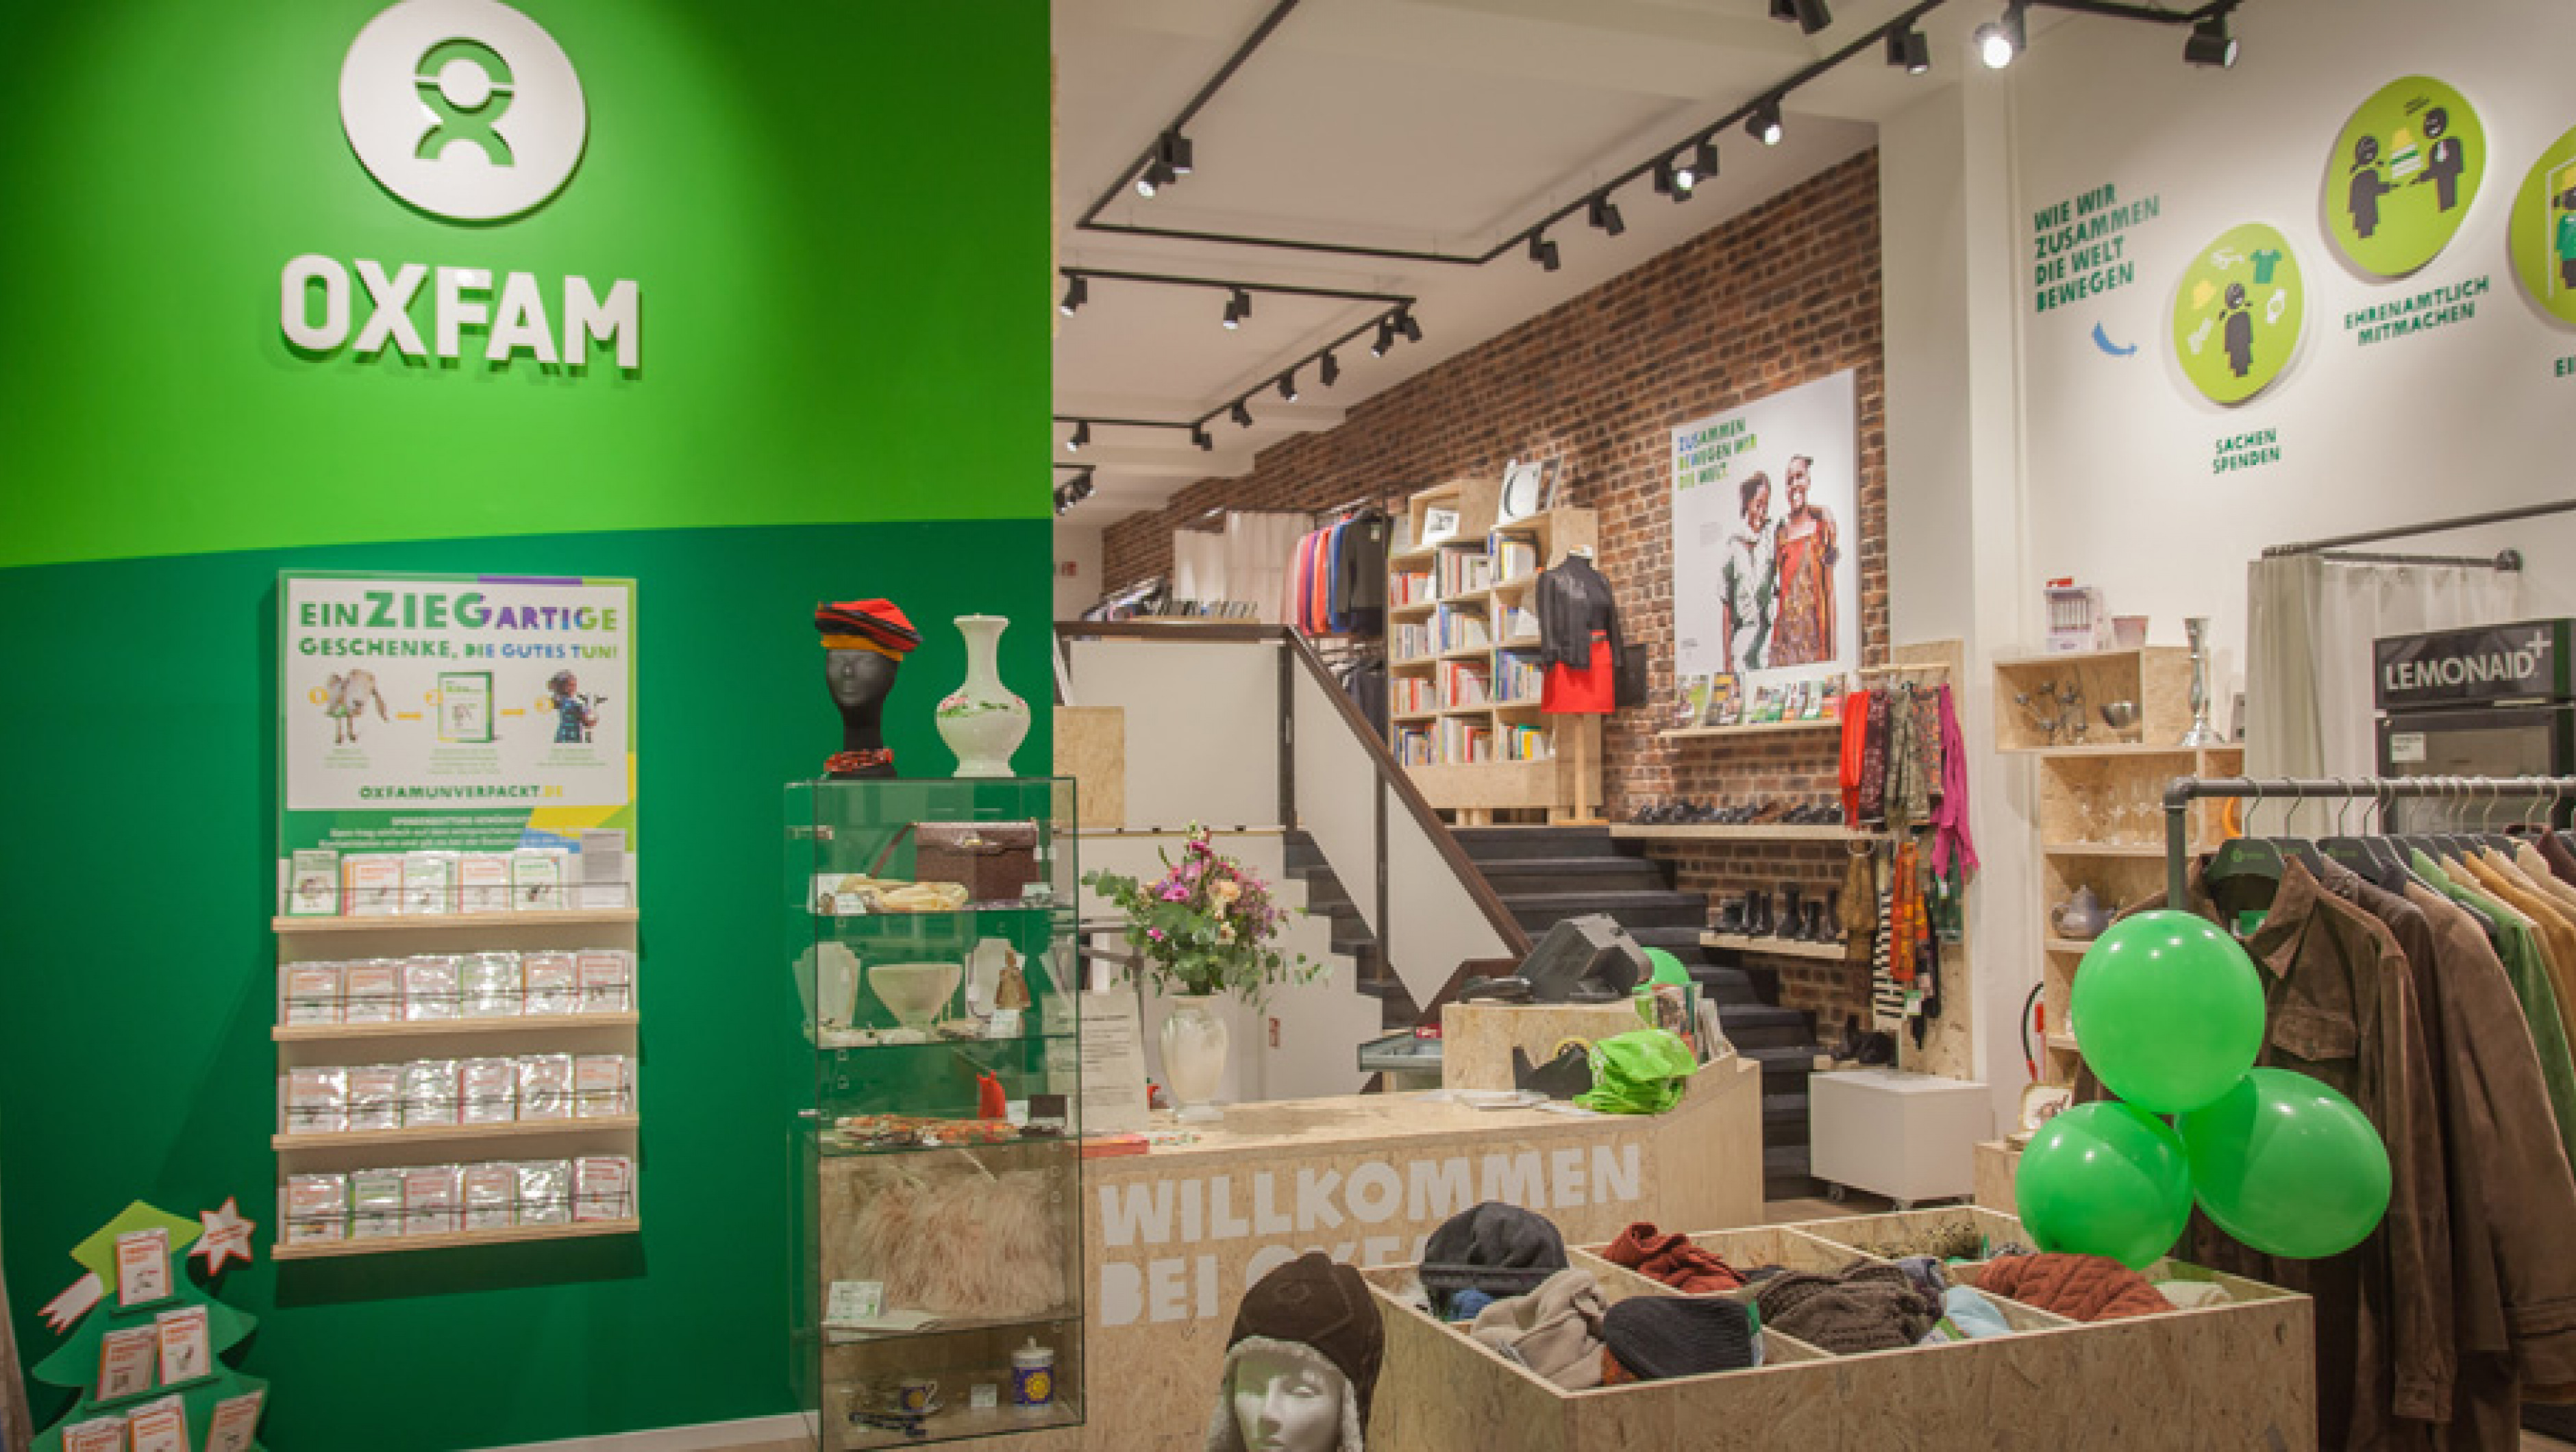 Innenansicht Oxfam Shop Berlin-Kreuzberg